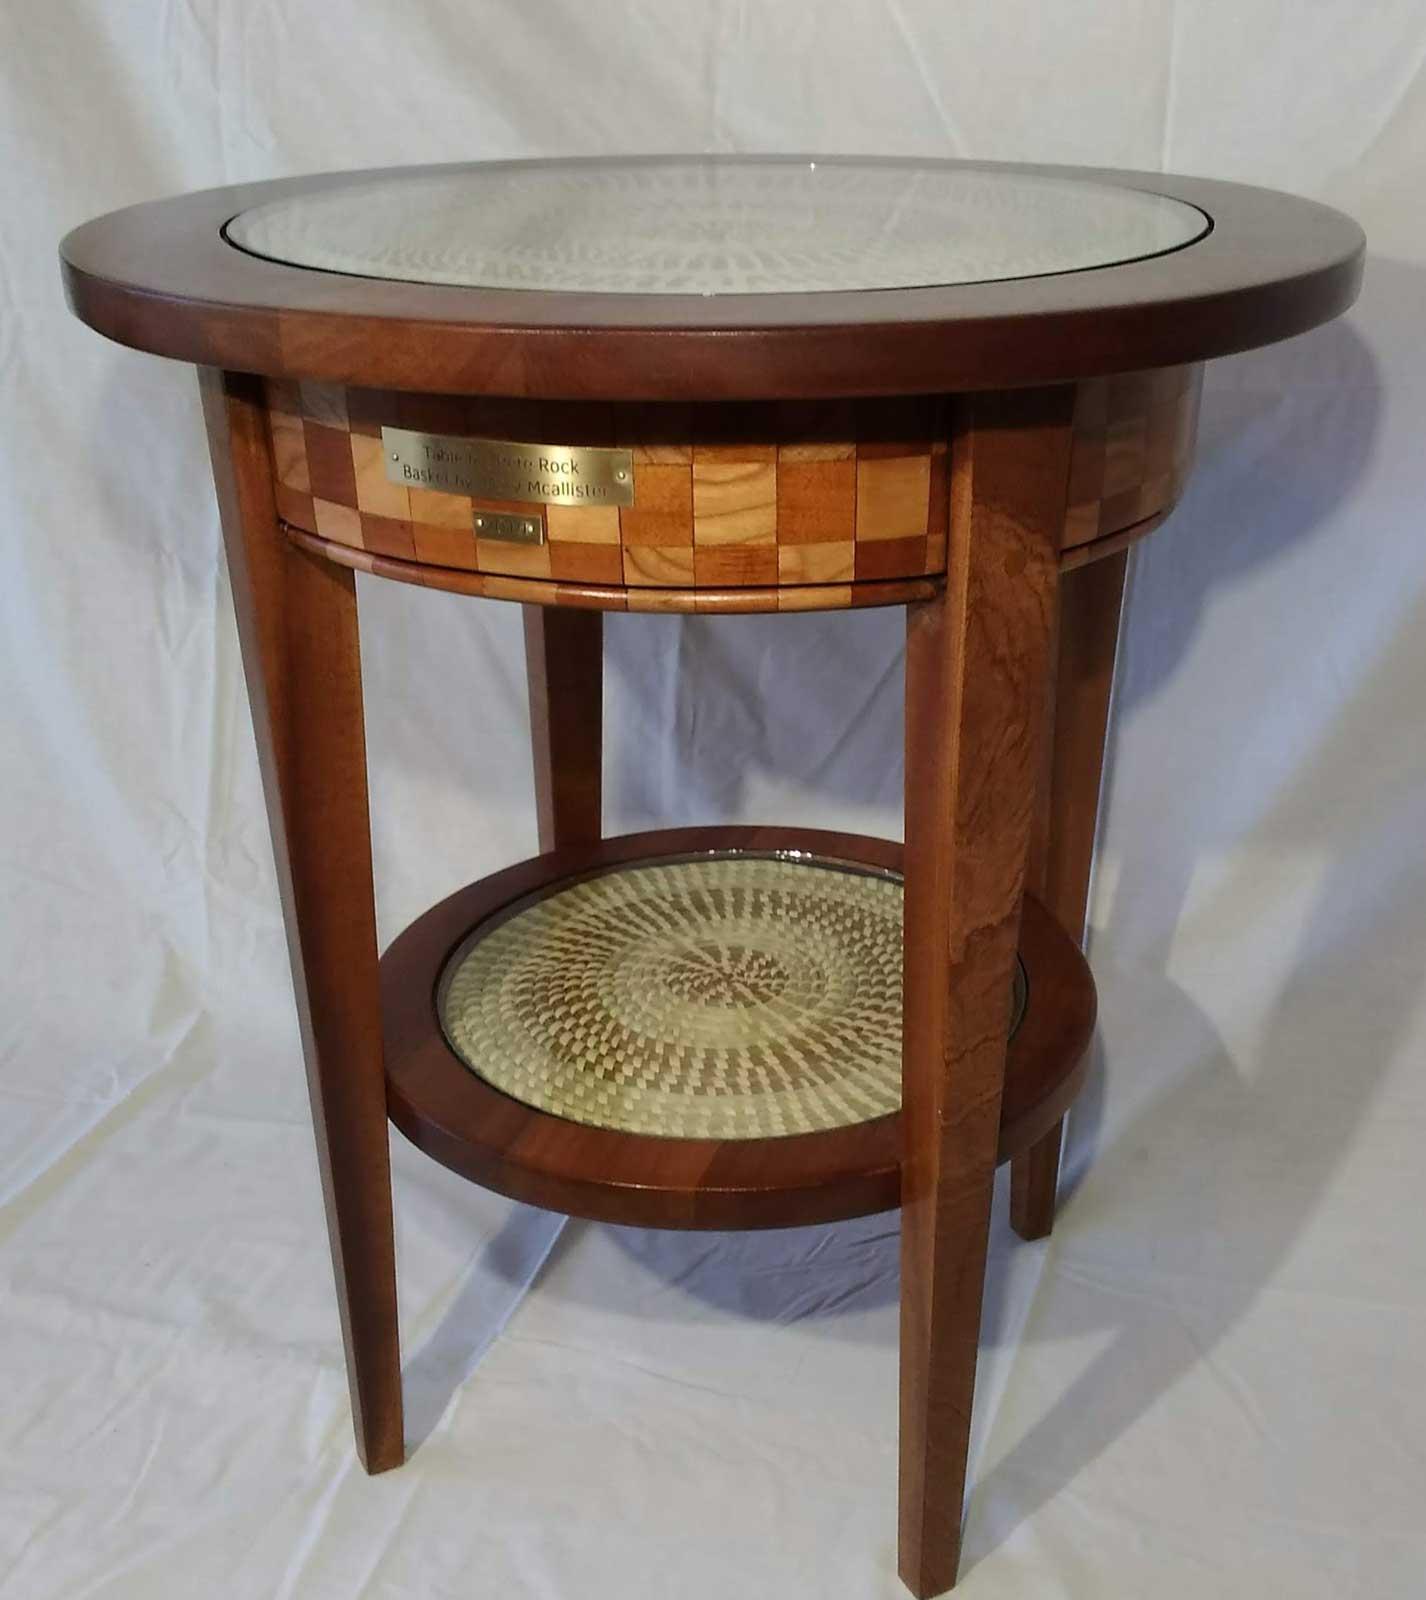 Pete Rock Sweet Grass Table #43 $1,400